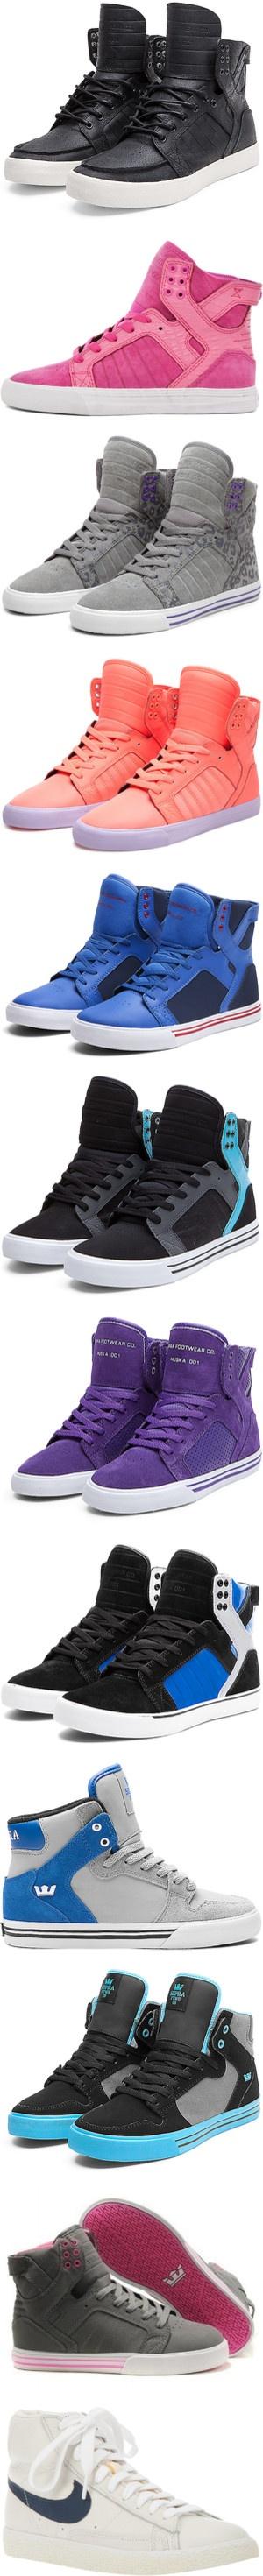 Nike vs. Adidas vs. Converse